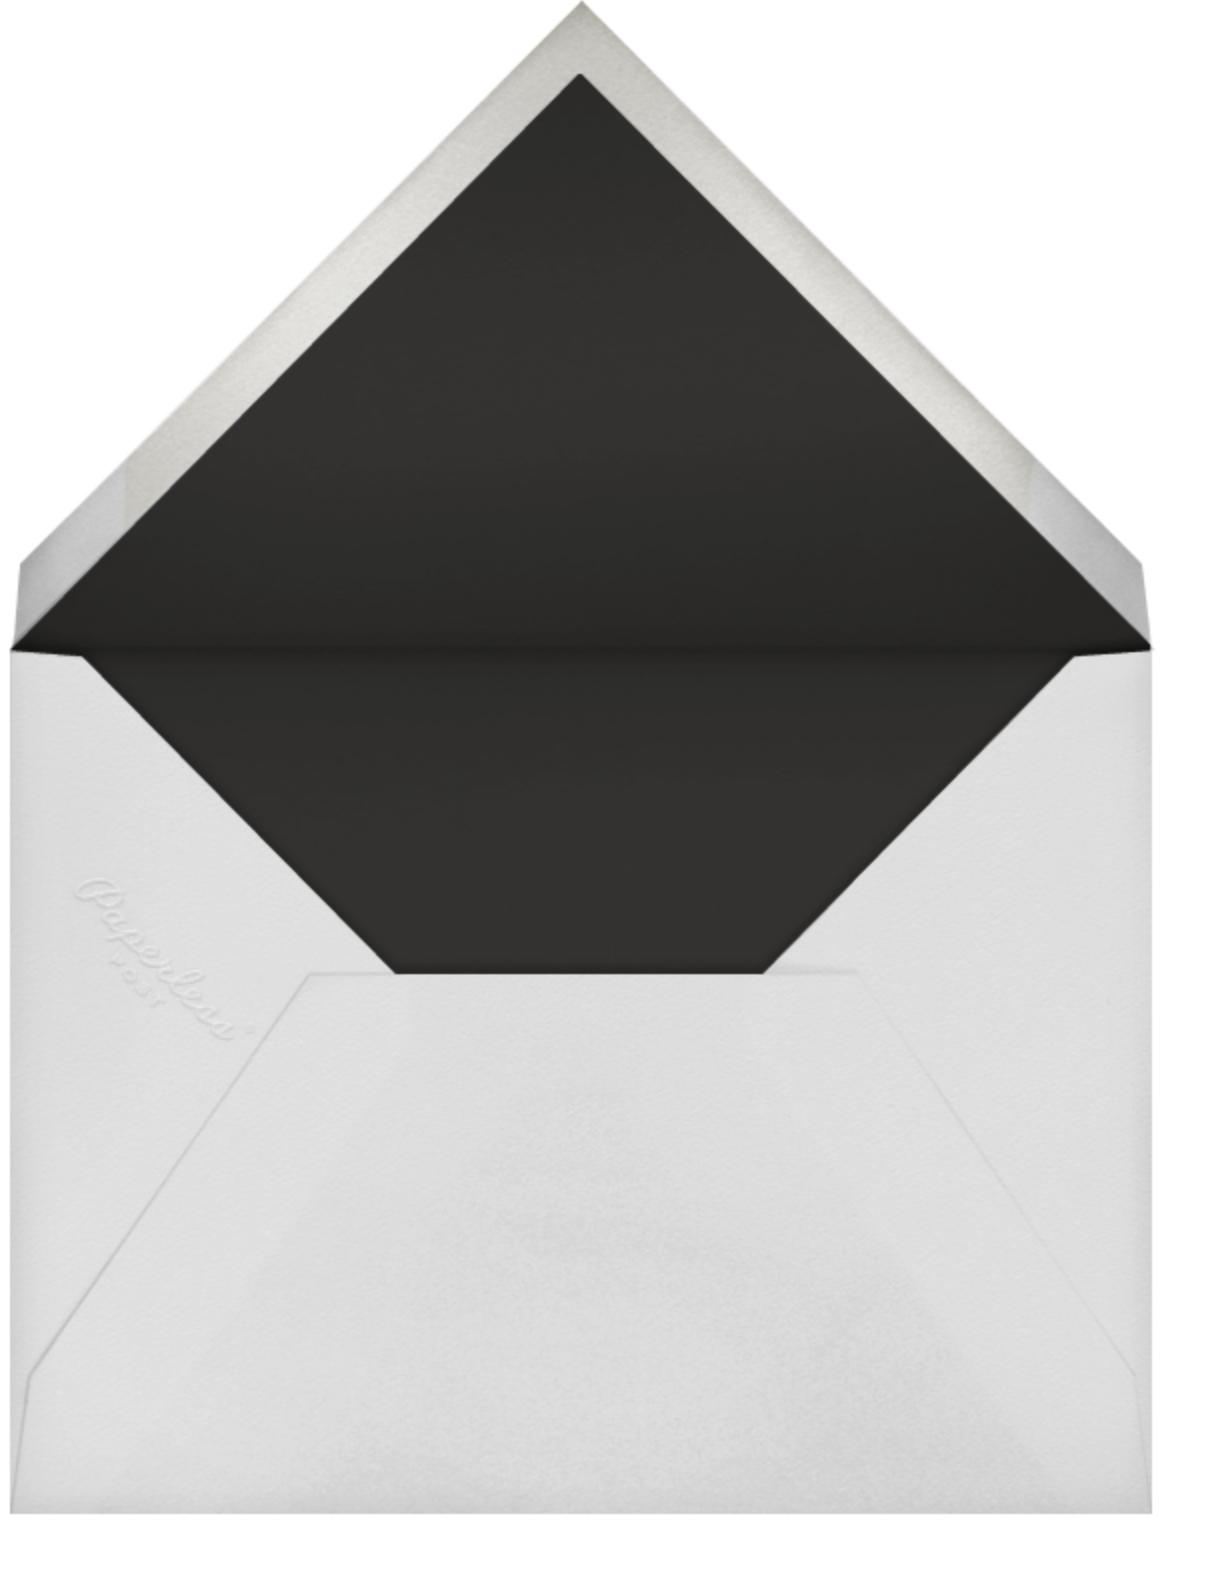 Falling Poppies II (Stationery) - White/Navy - Oscar de la Renta - Envelope